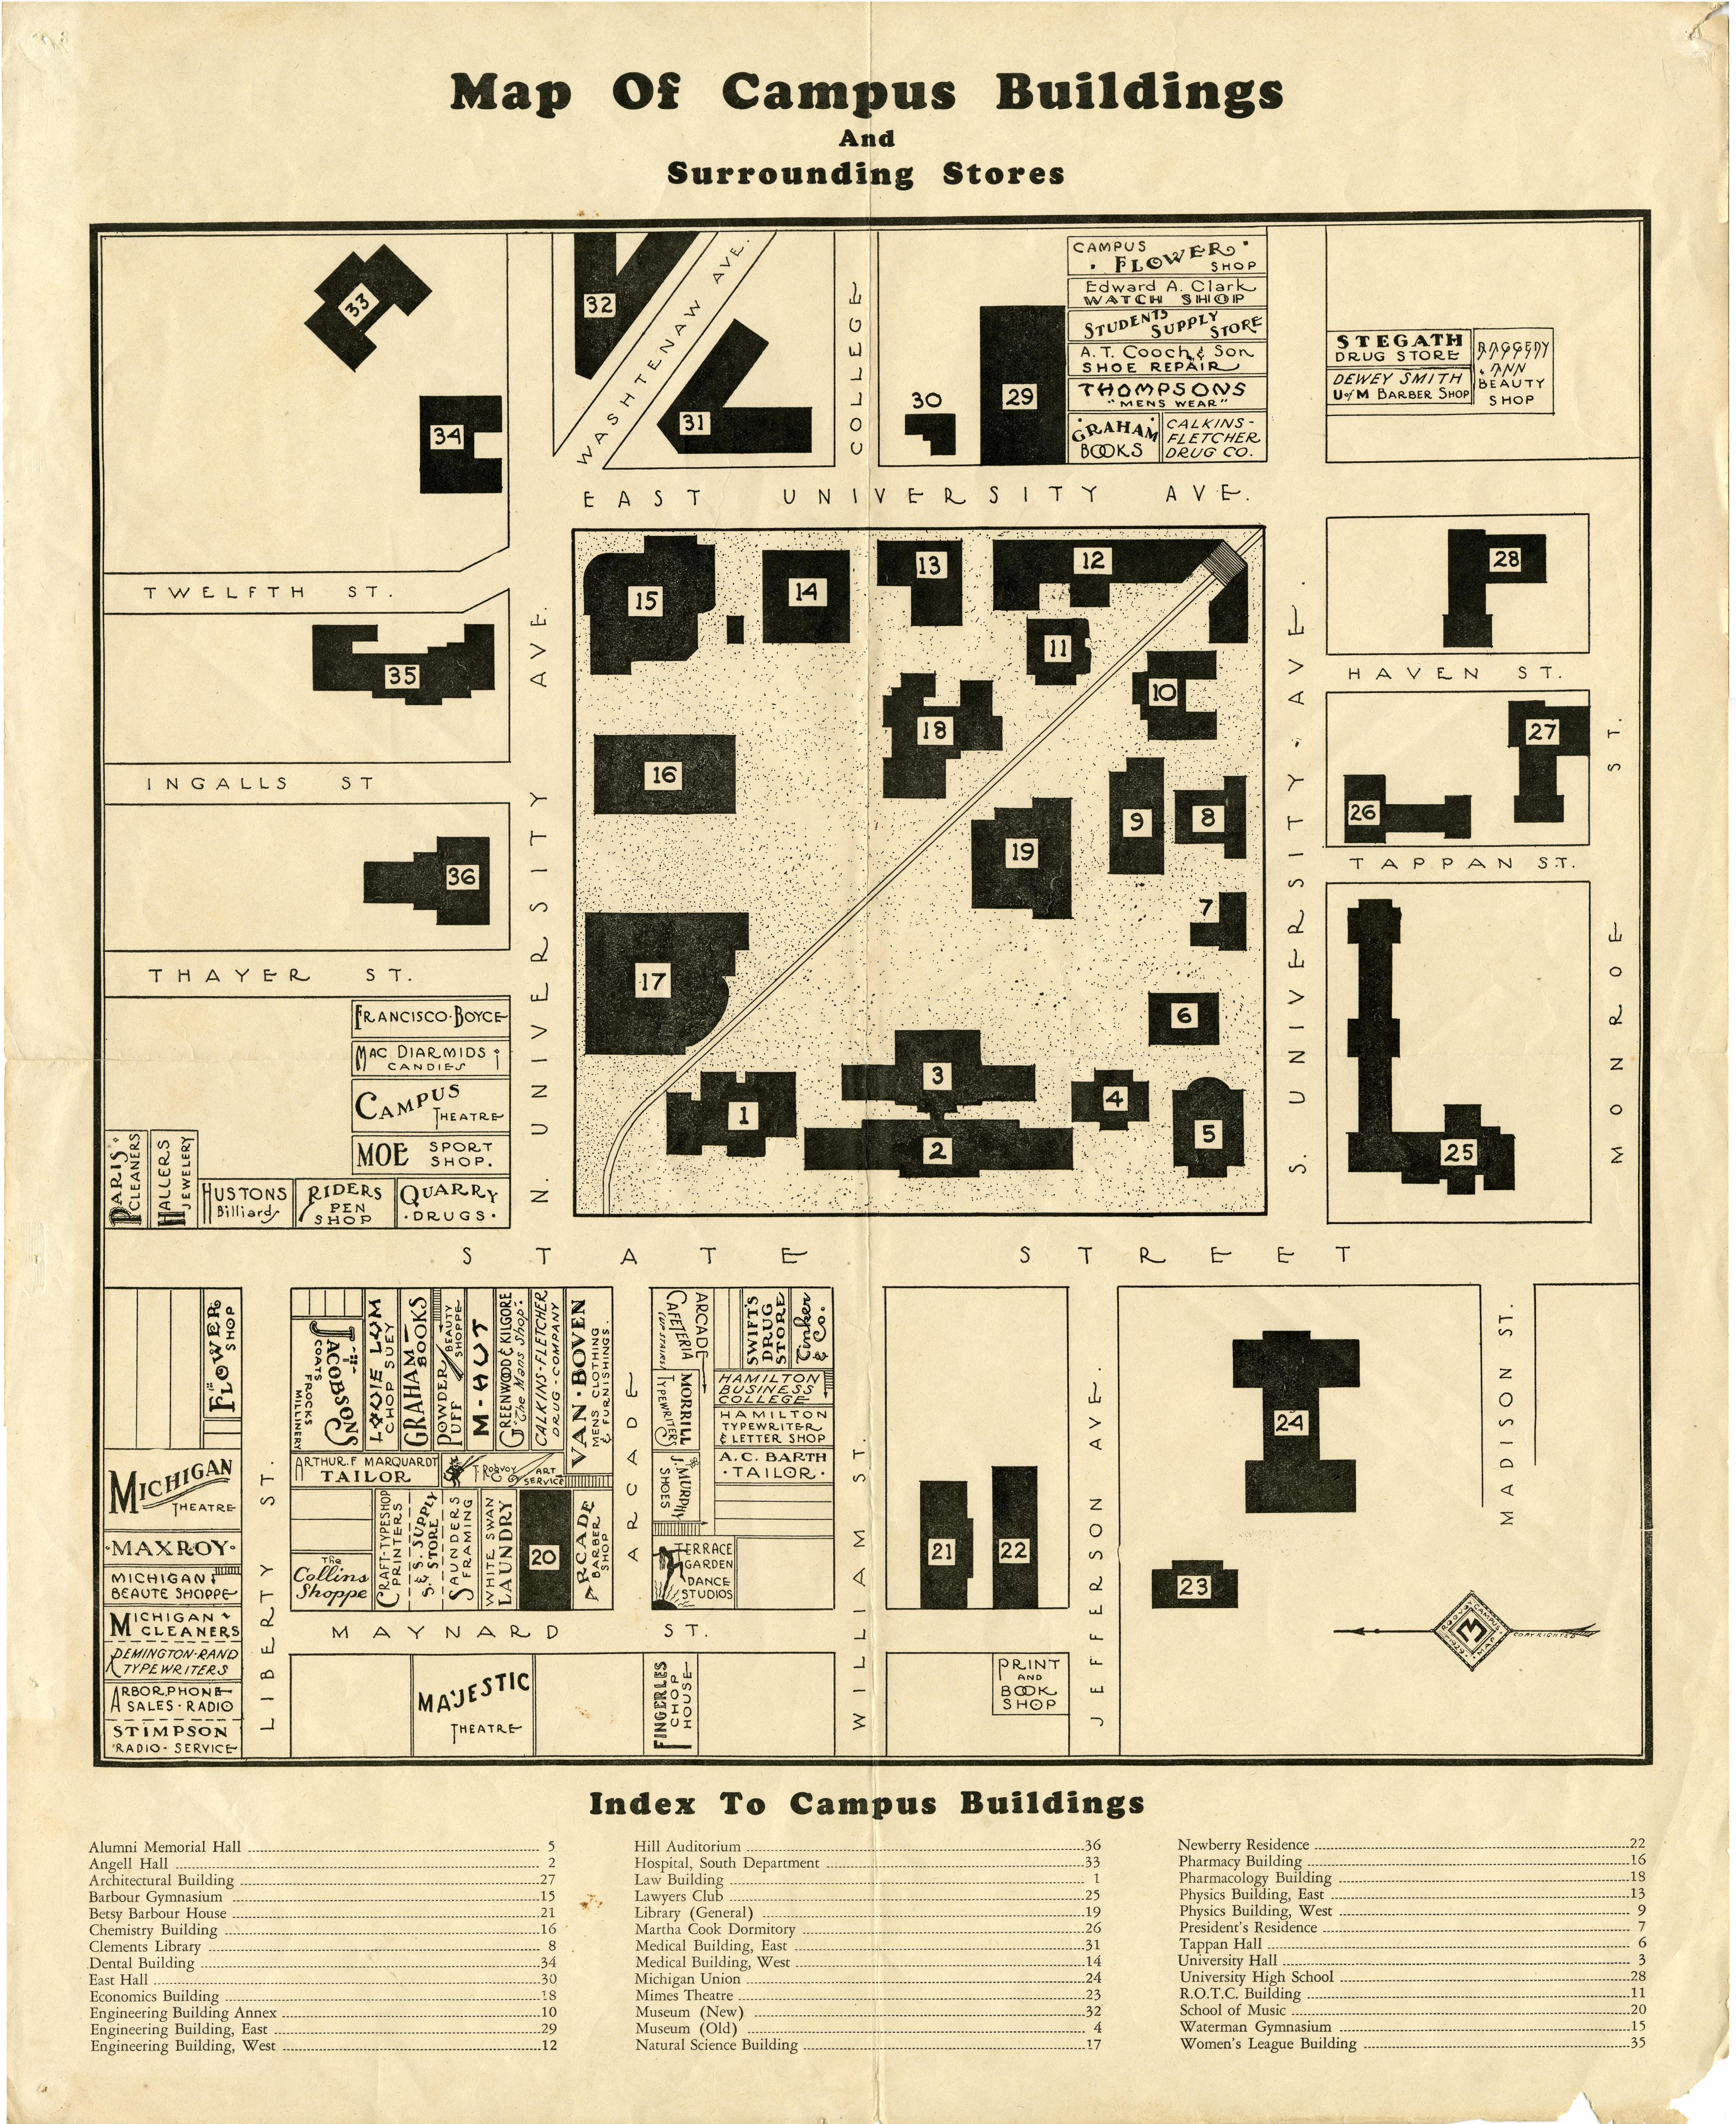 Bentley Image Bank, Bentley Historical Library: Map of campus